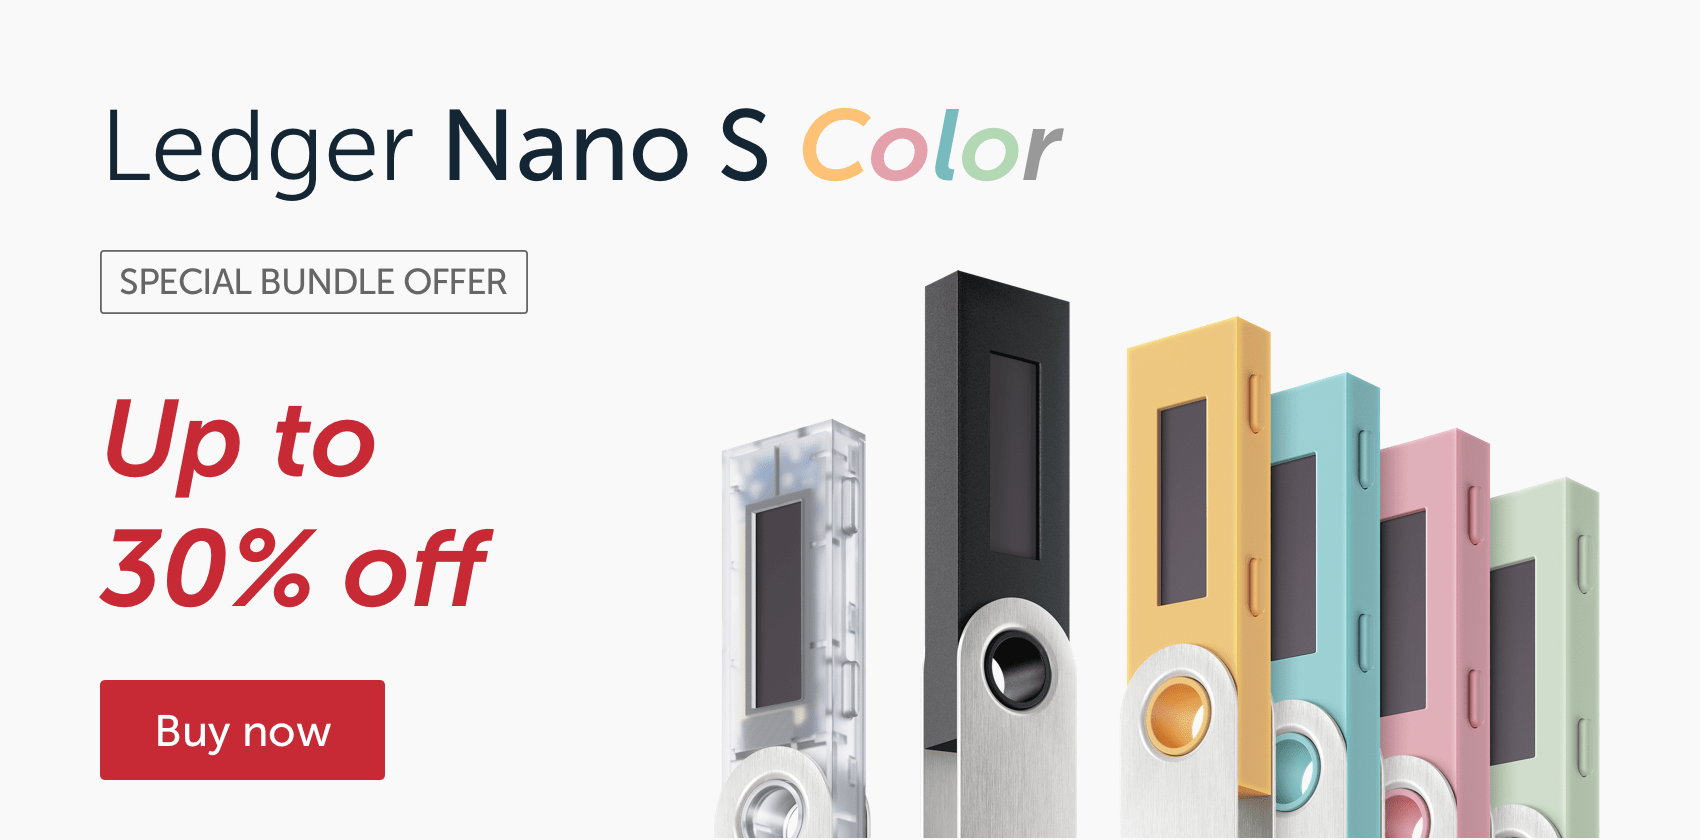 Ledger Wallet Nano S Black Friday Cyber Monday 2021 Discount Promo Code